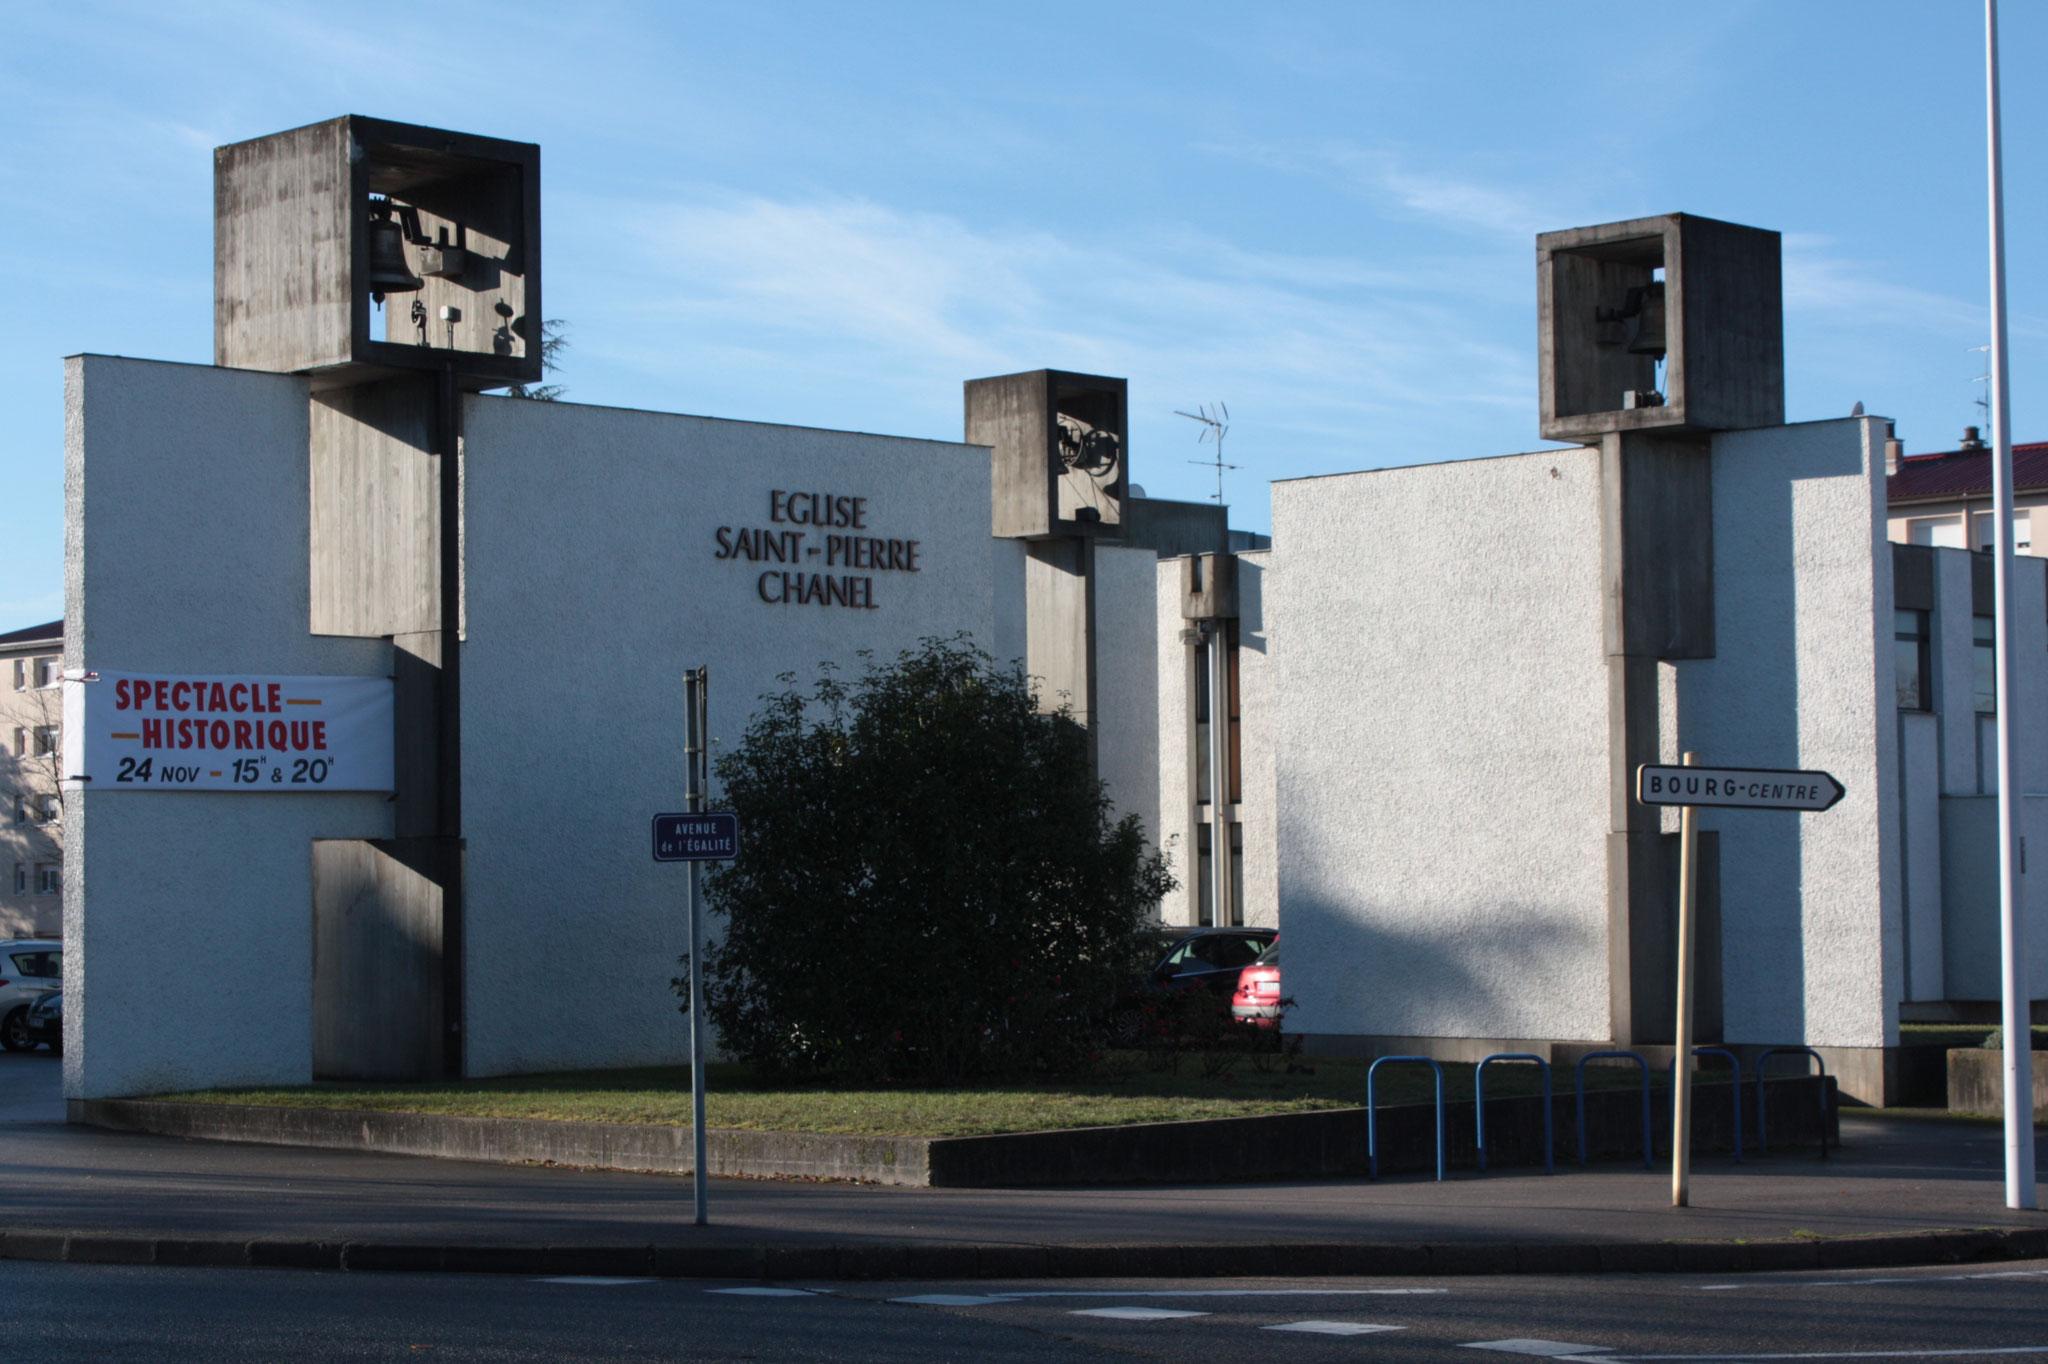 Eglise St Pierre Chanel - Bourg en Bresse - (c) JDR